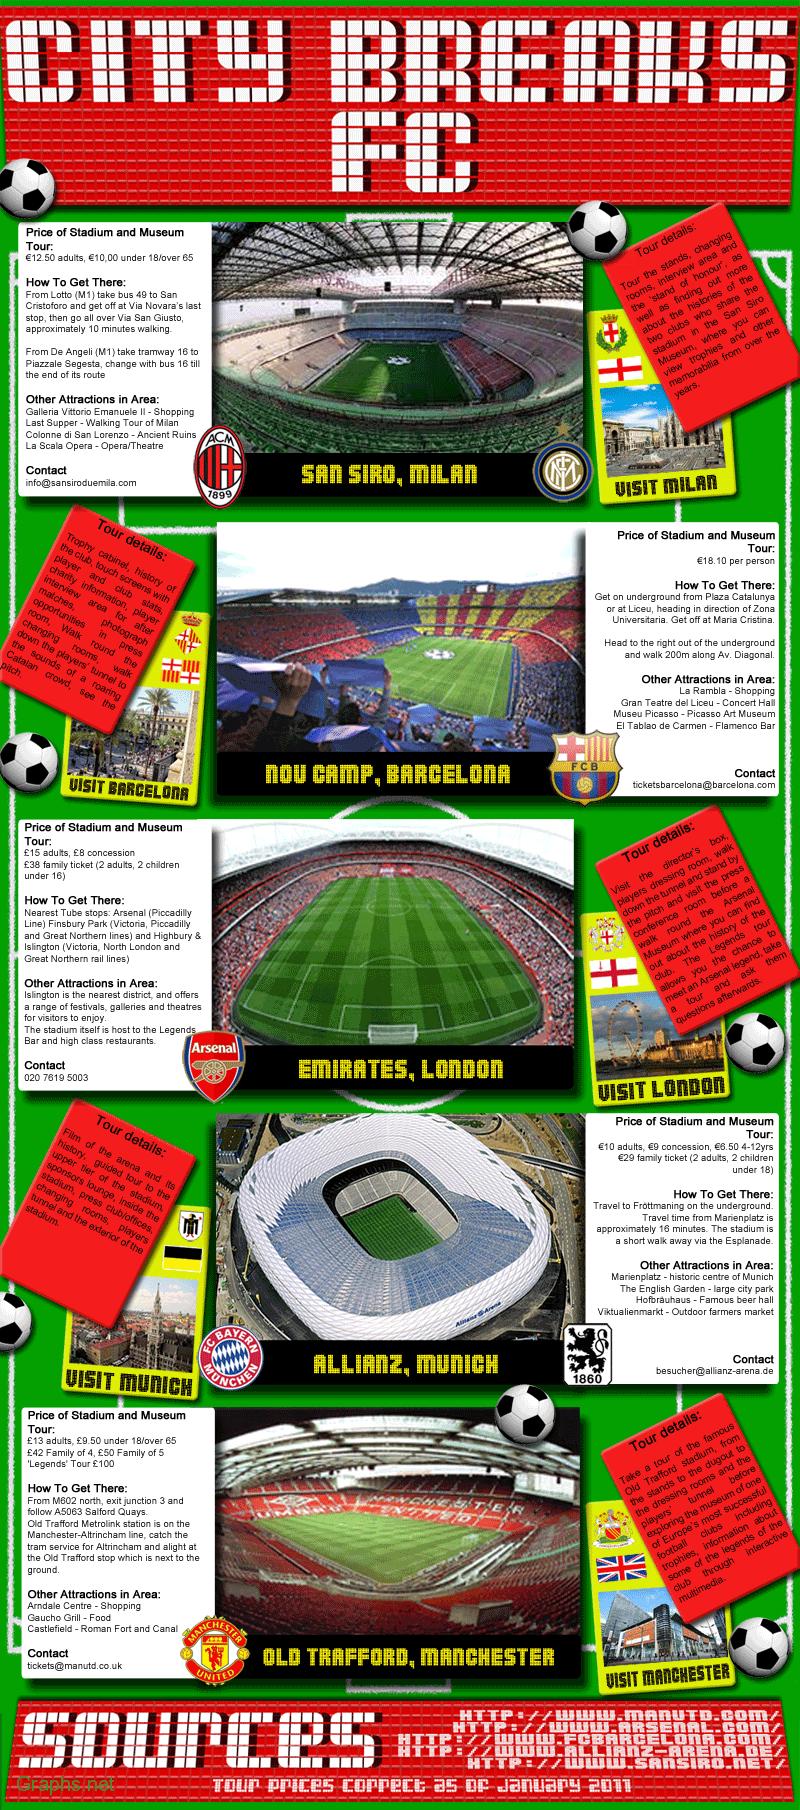 Top European Football Stadiums and their Tour Details